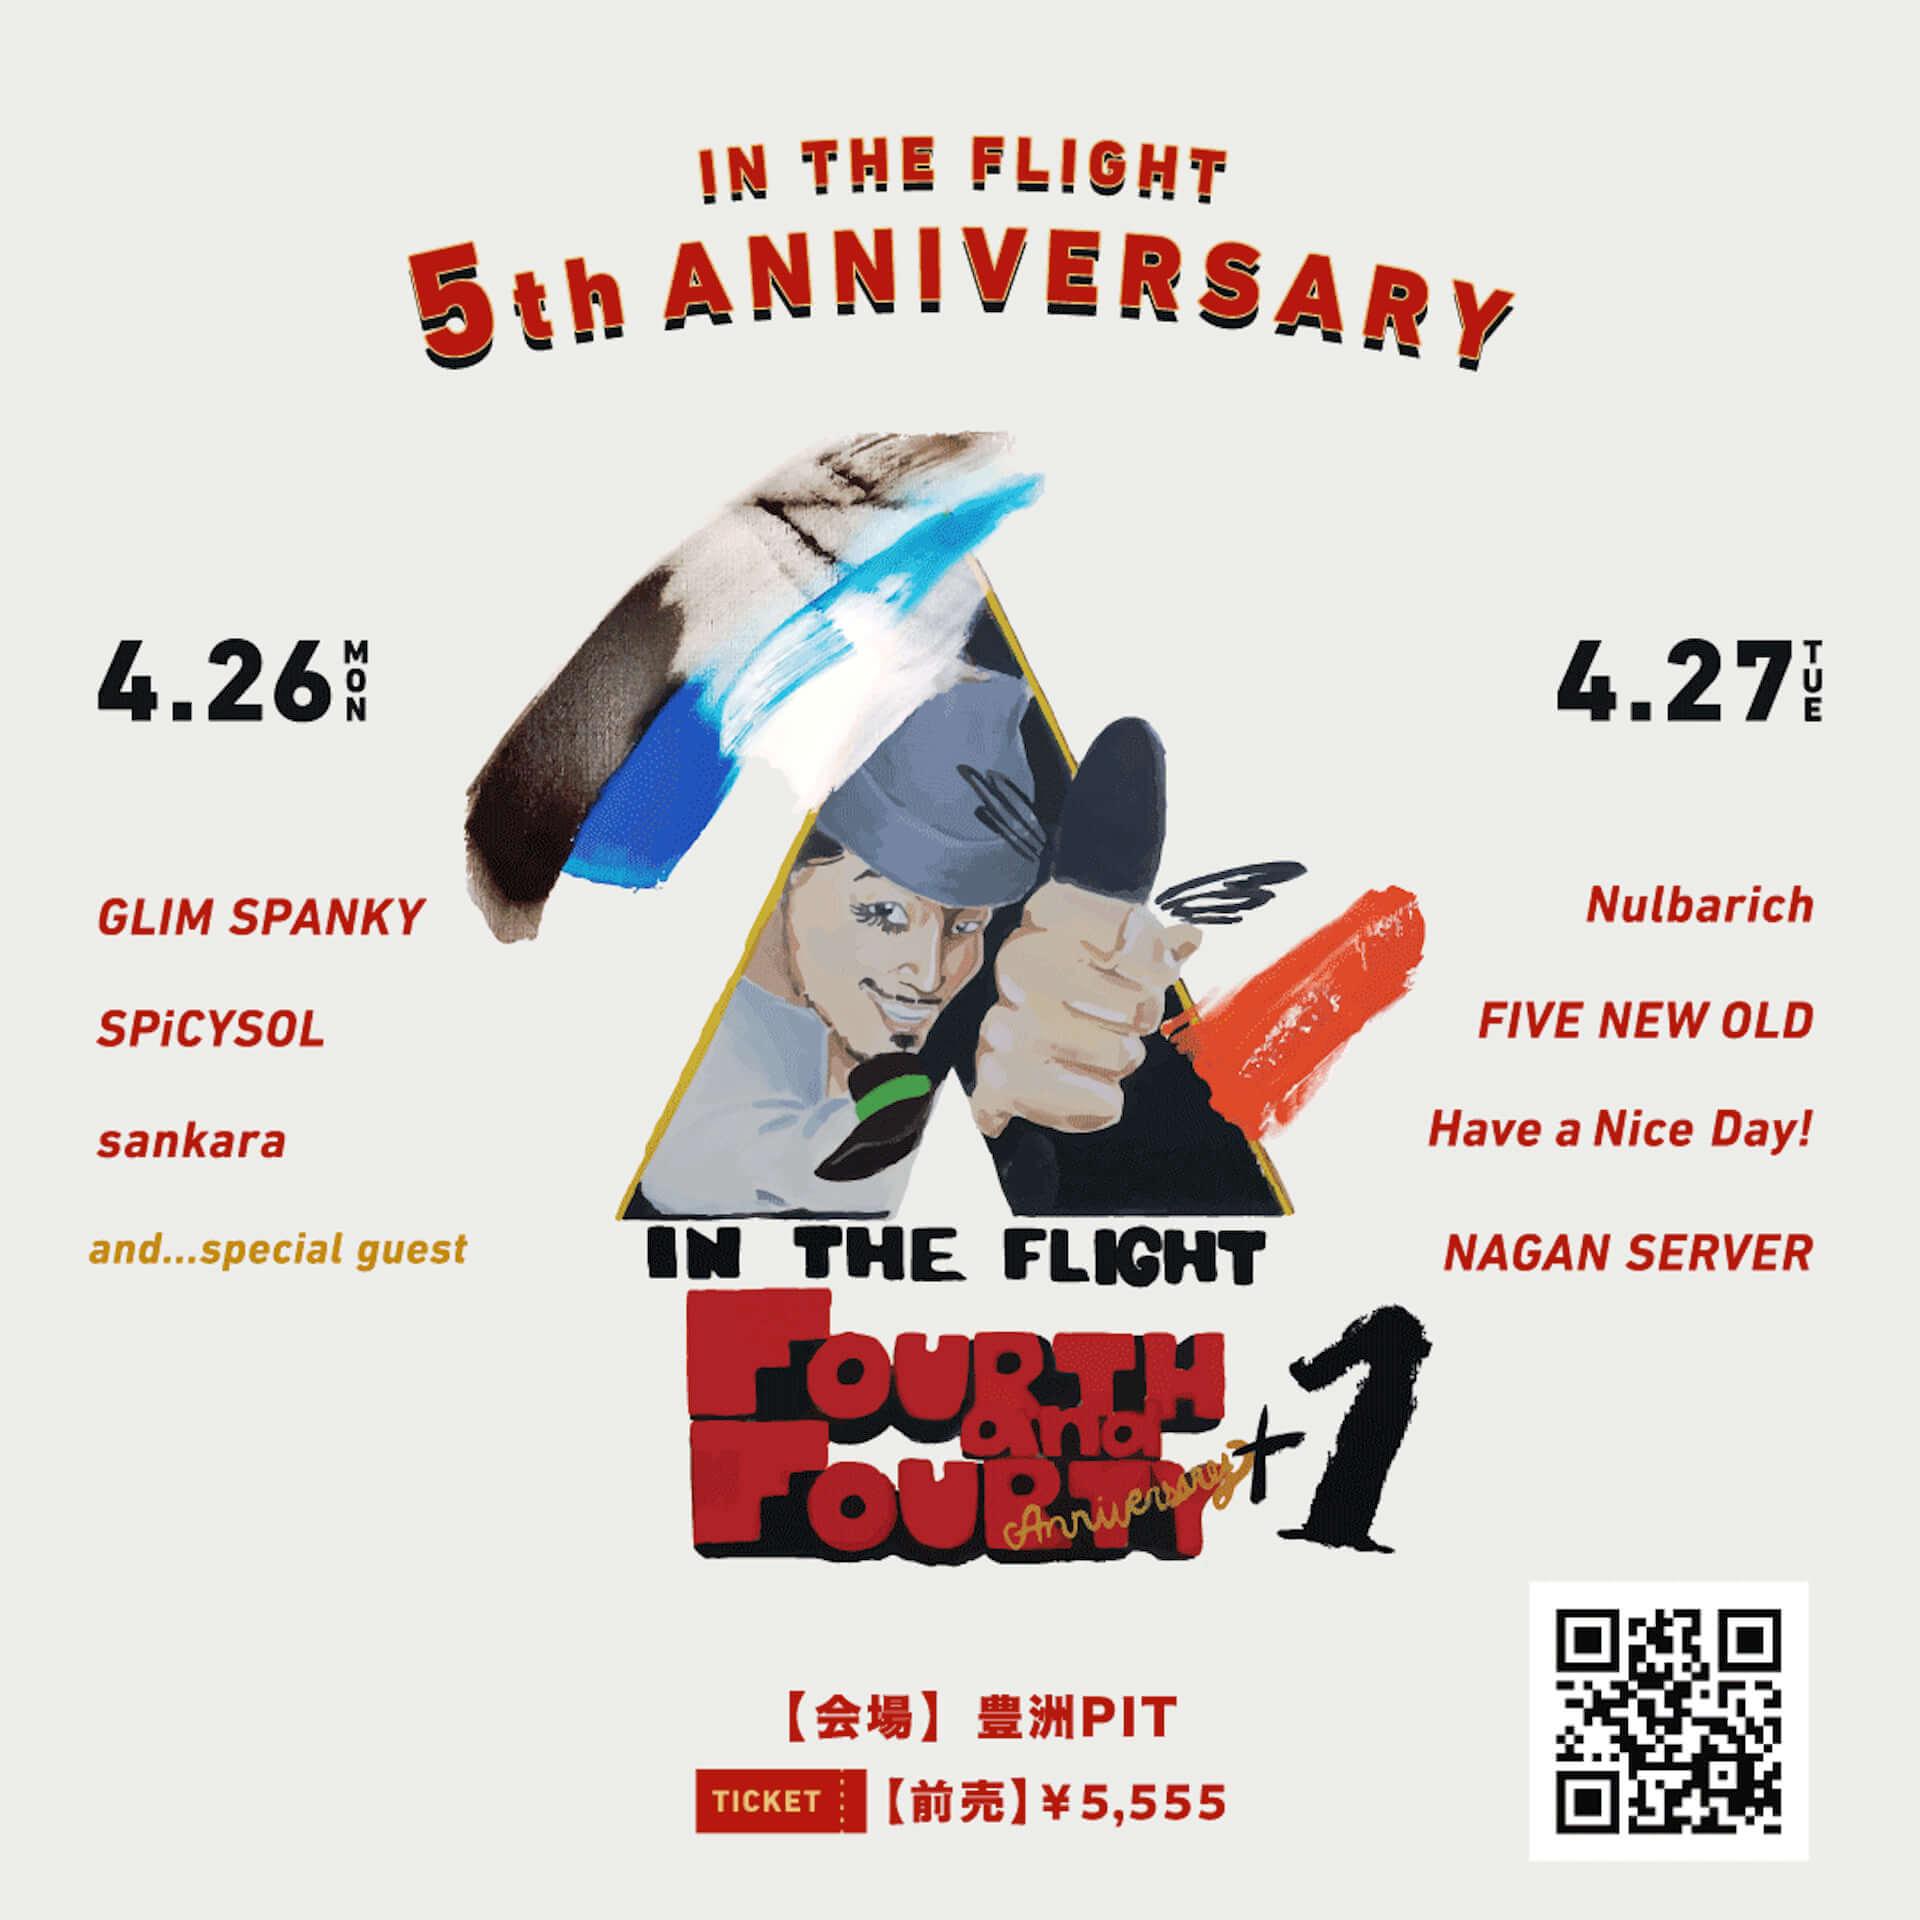 Nulbarich、GLIM SPANKY、FIVE NEW OLD、NAGAN SERVERらが出演!IN THE FLIGHTの5周年記念イベントが開催決定 music210311_intheflight5th_3-1920x1920